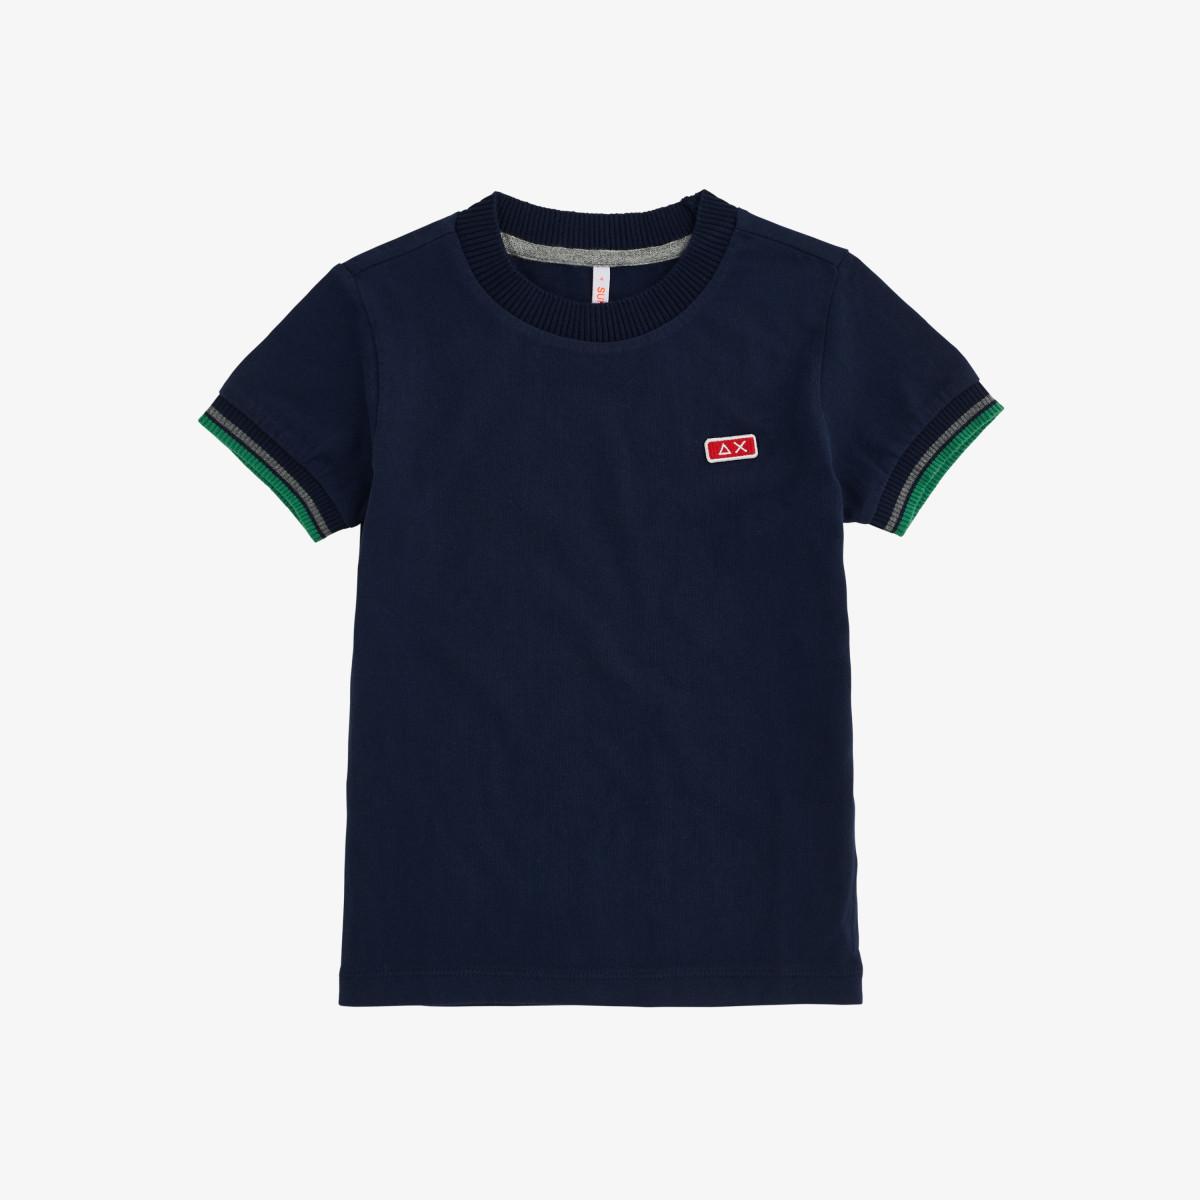 BOY'S T-SHIRT HIGH CUFF RIB S/S NAVY BLUE